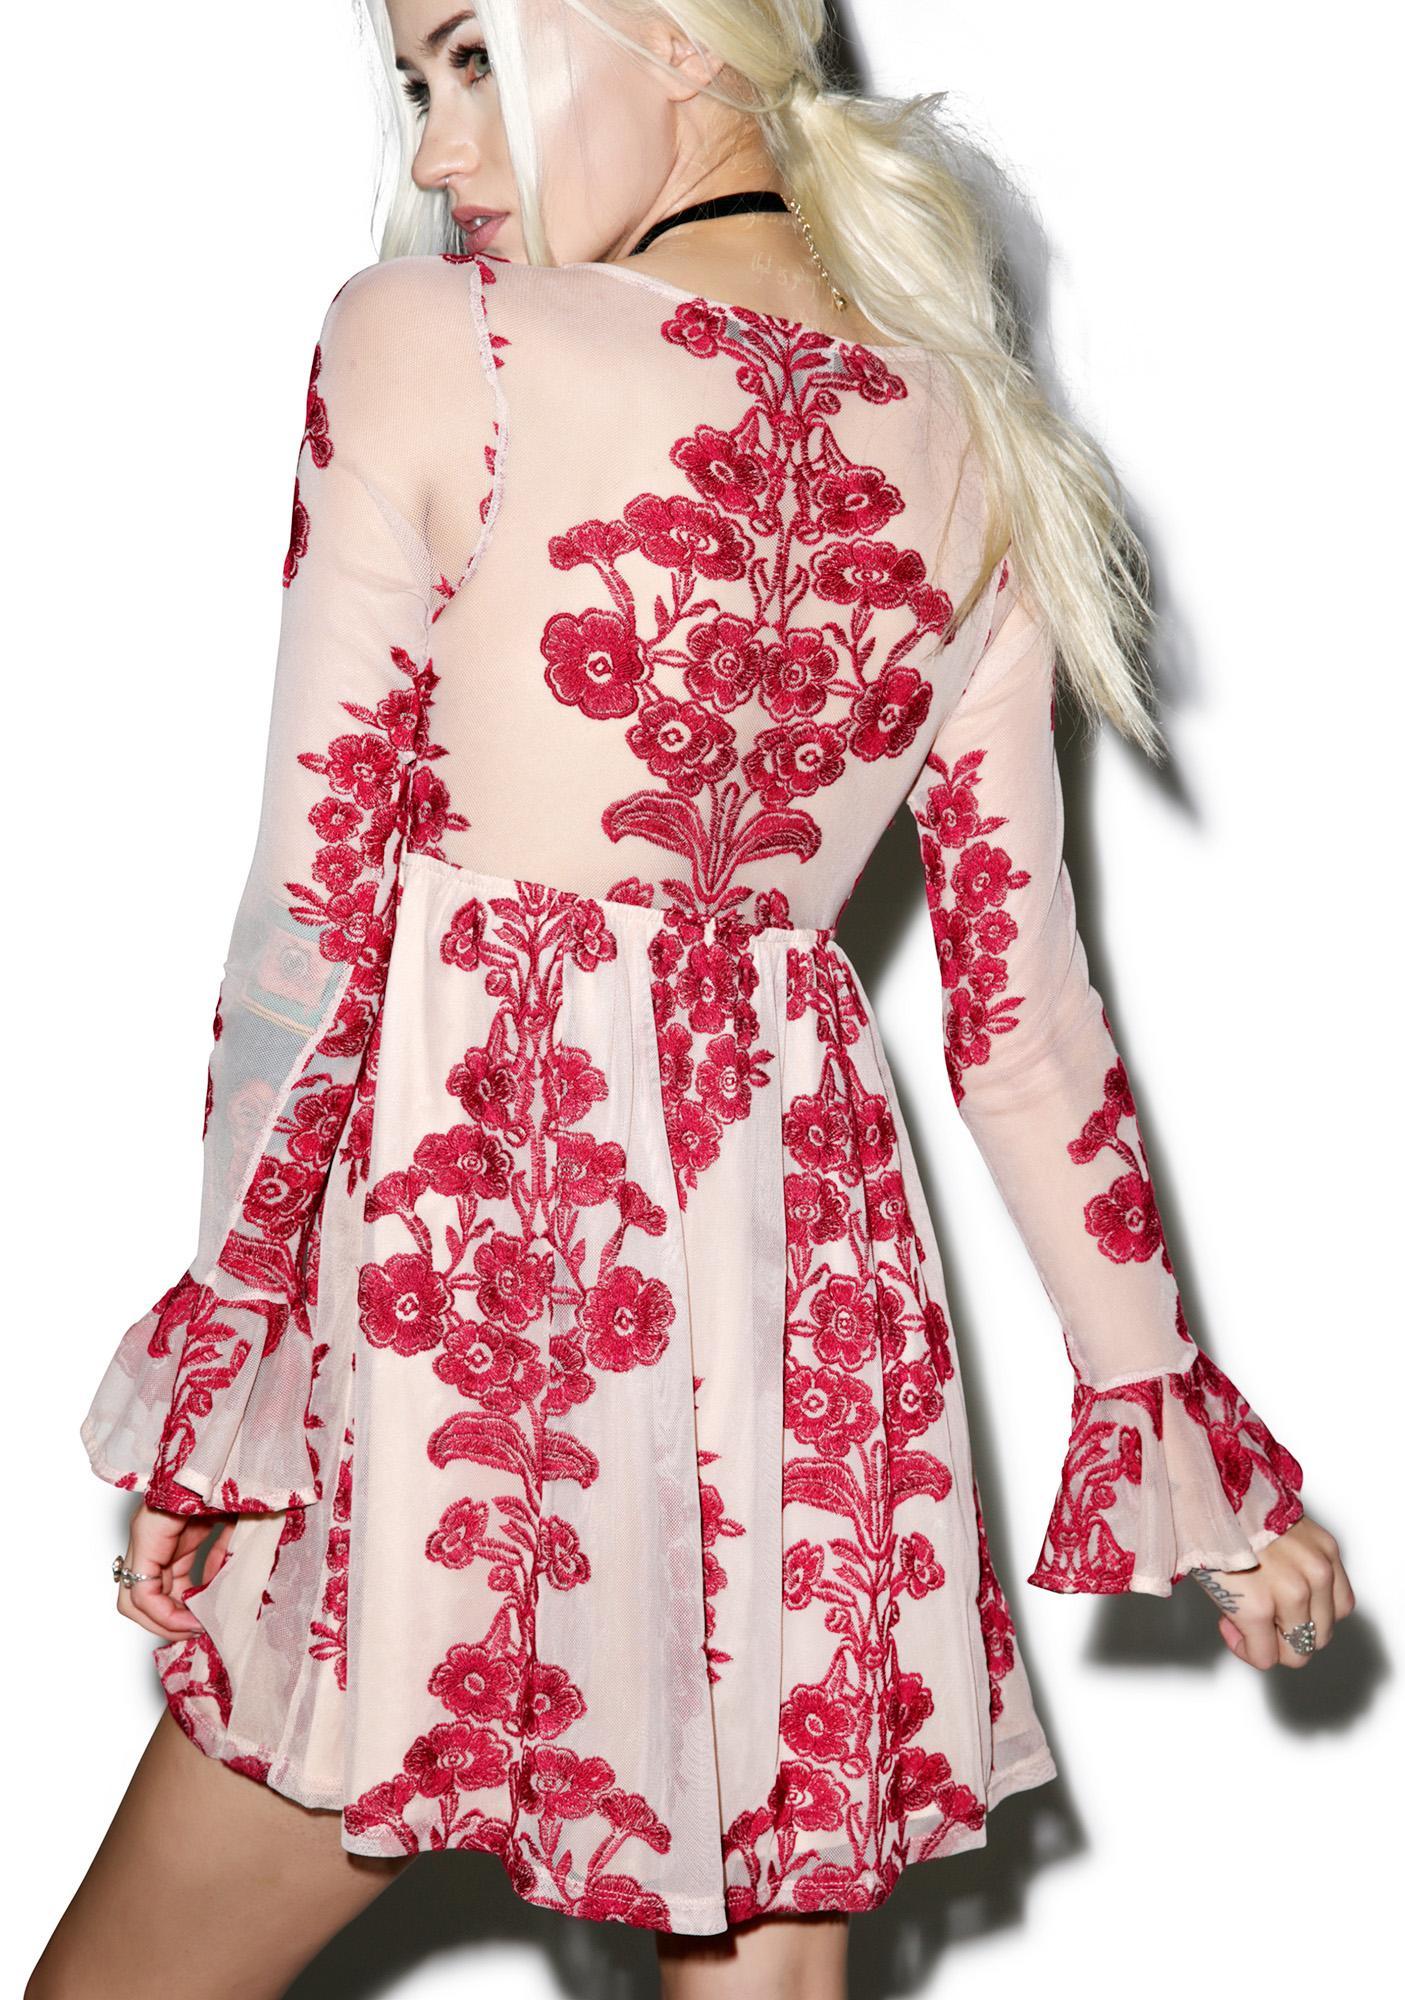 For Love & Lemons Temecula Wine Mini Dress